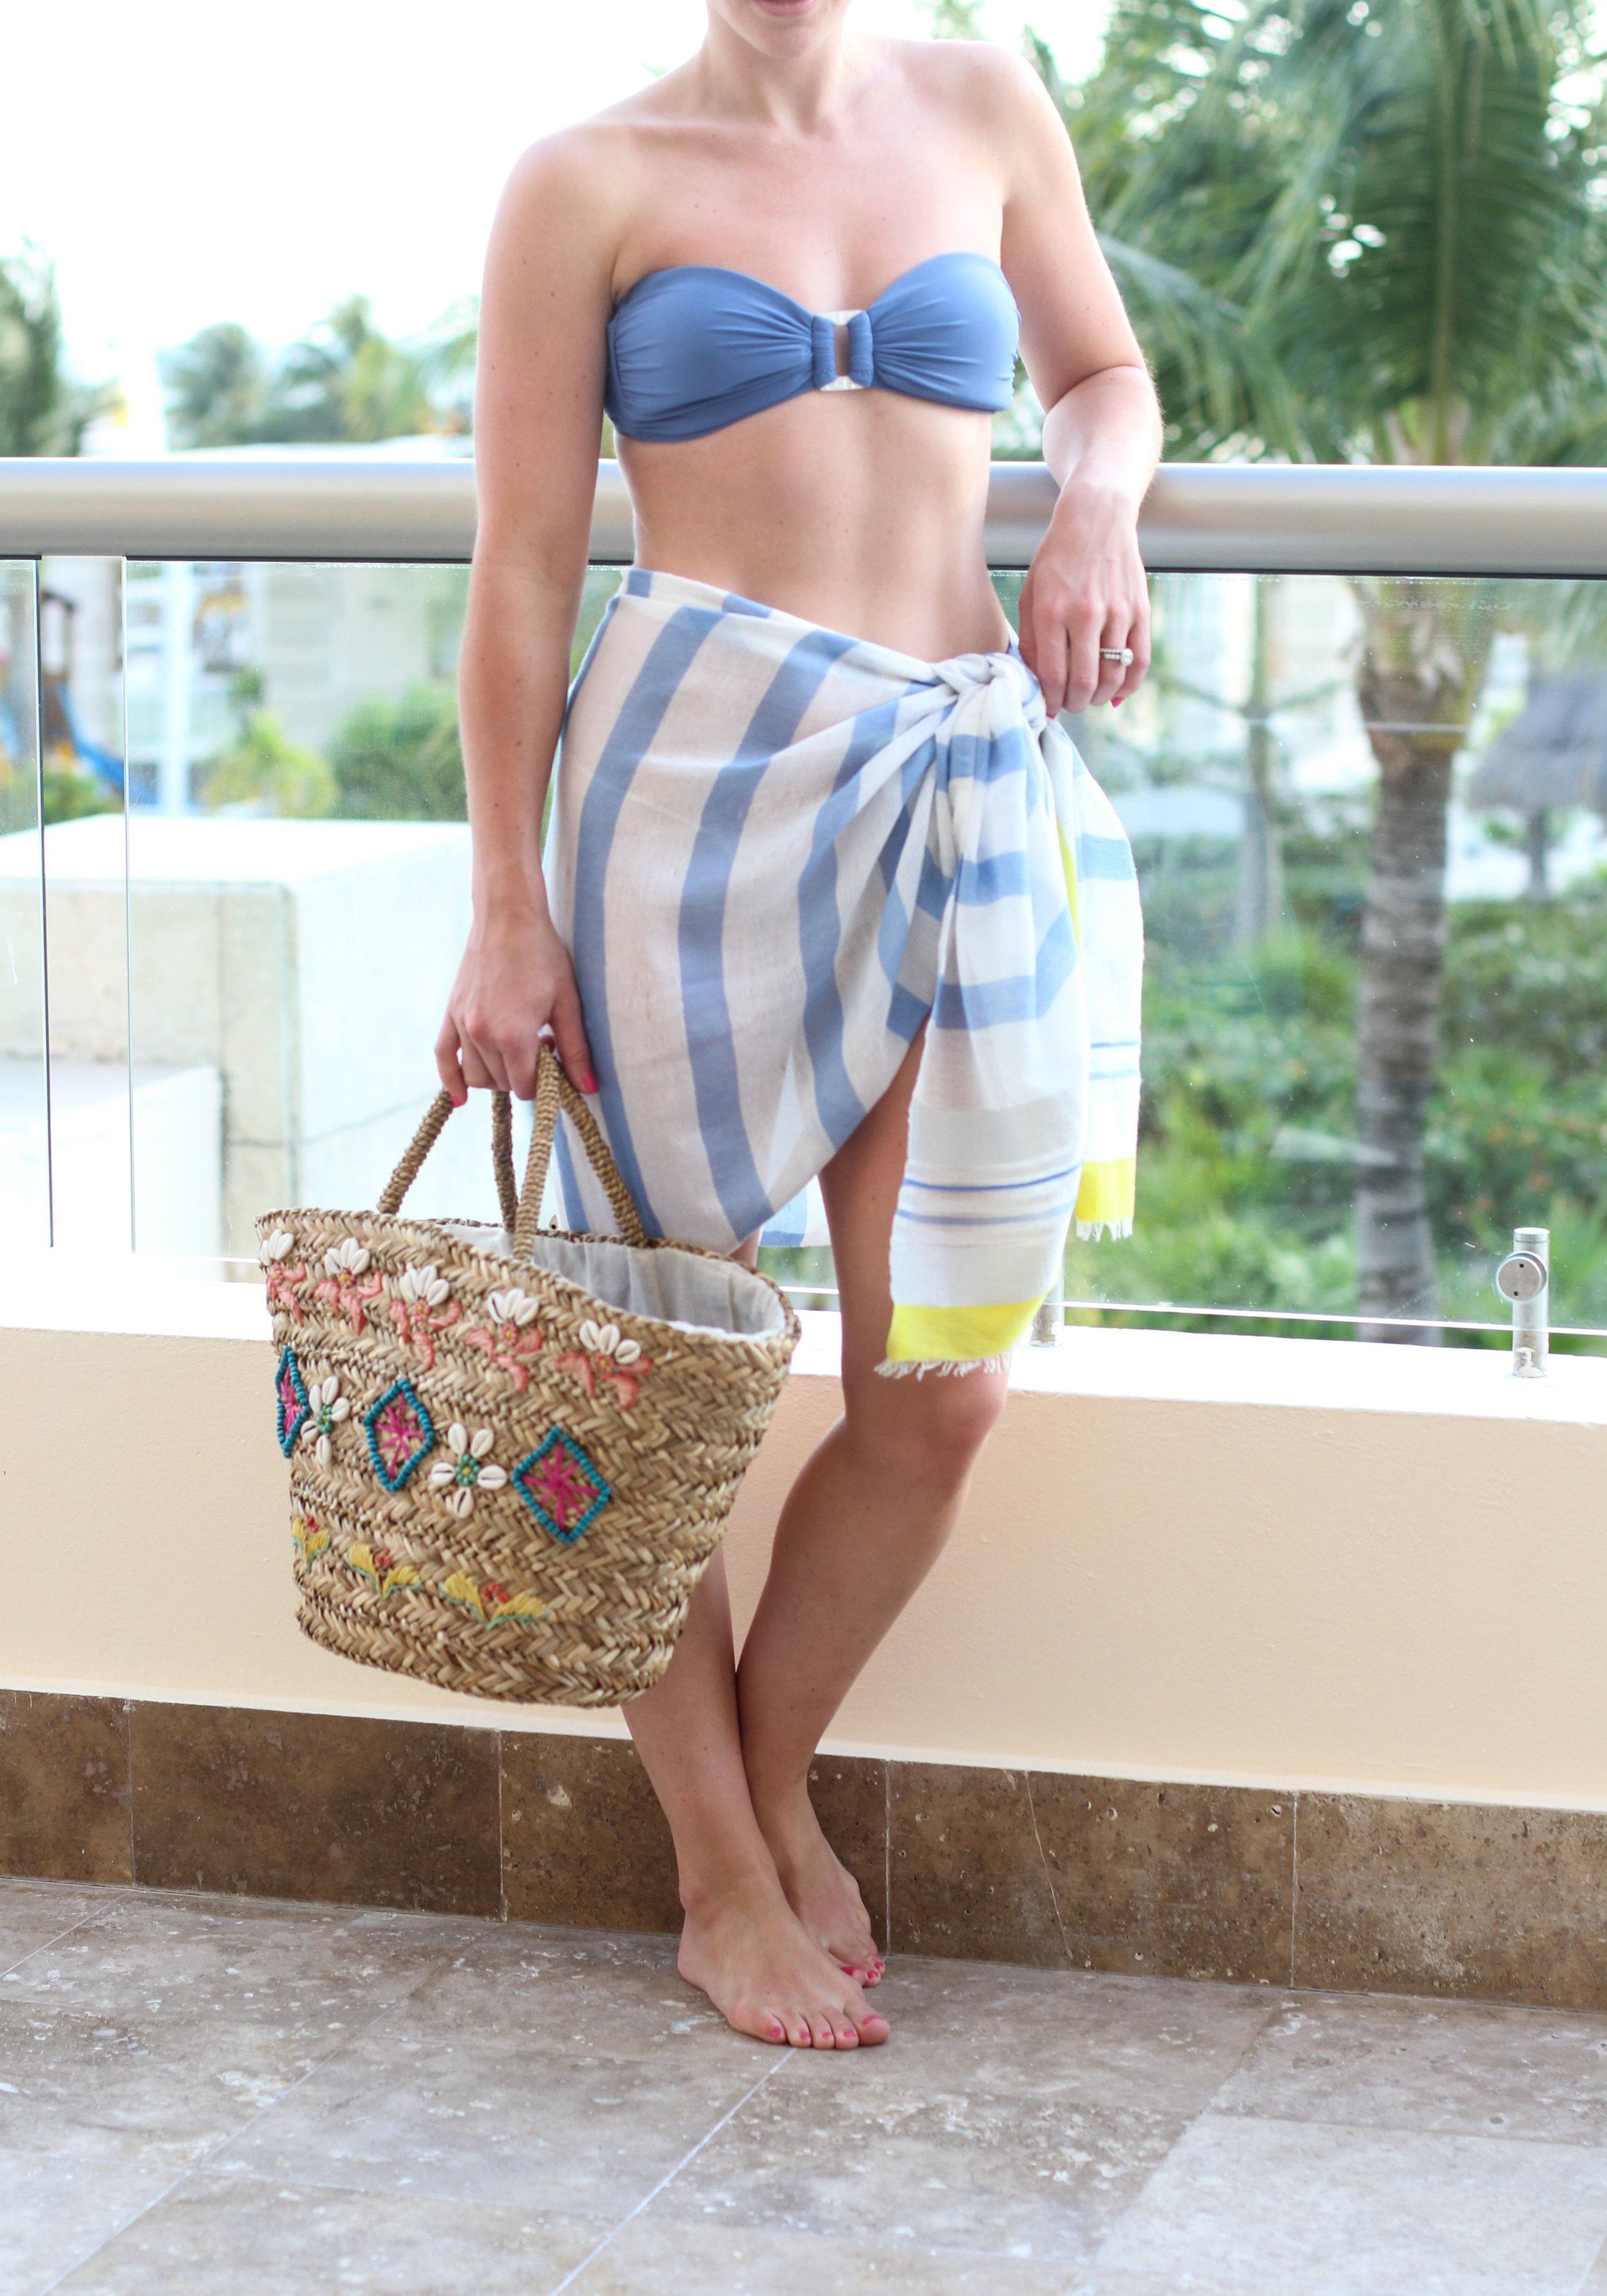 Helen Jon Bandeau Bikini, Scarf Worn as a Pareo, Hat Attack Beach Bag, Vacation Style